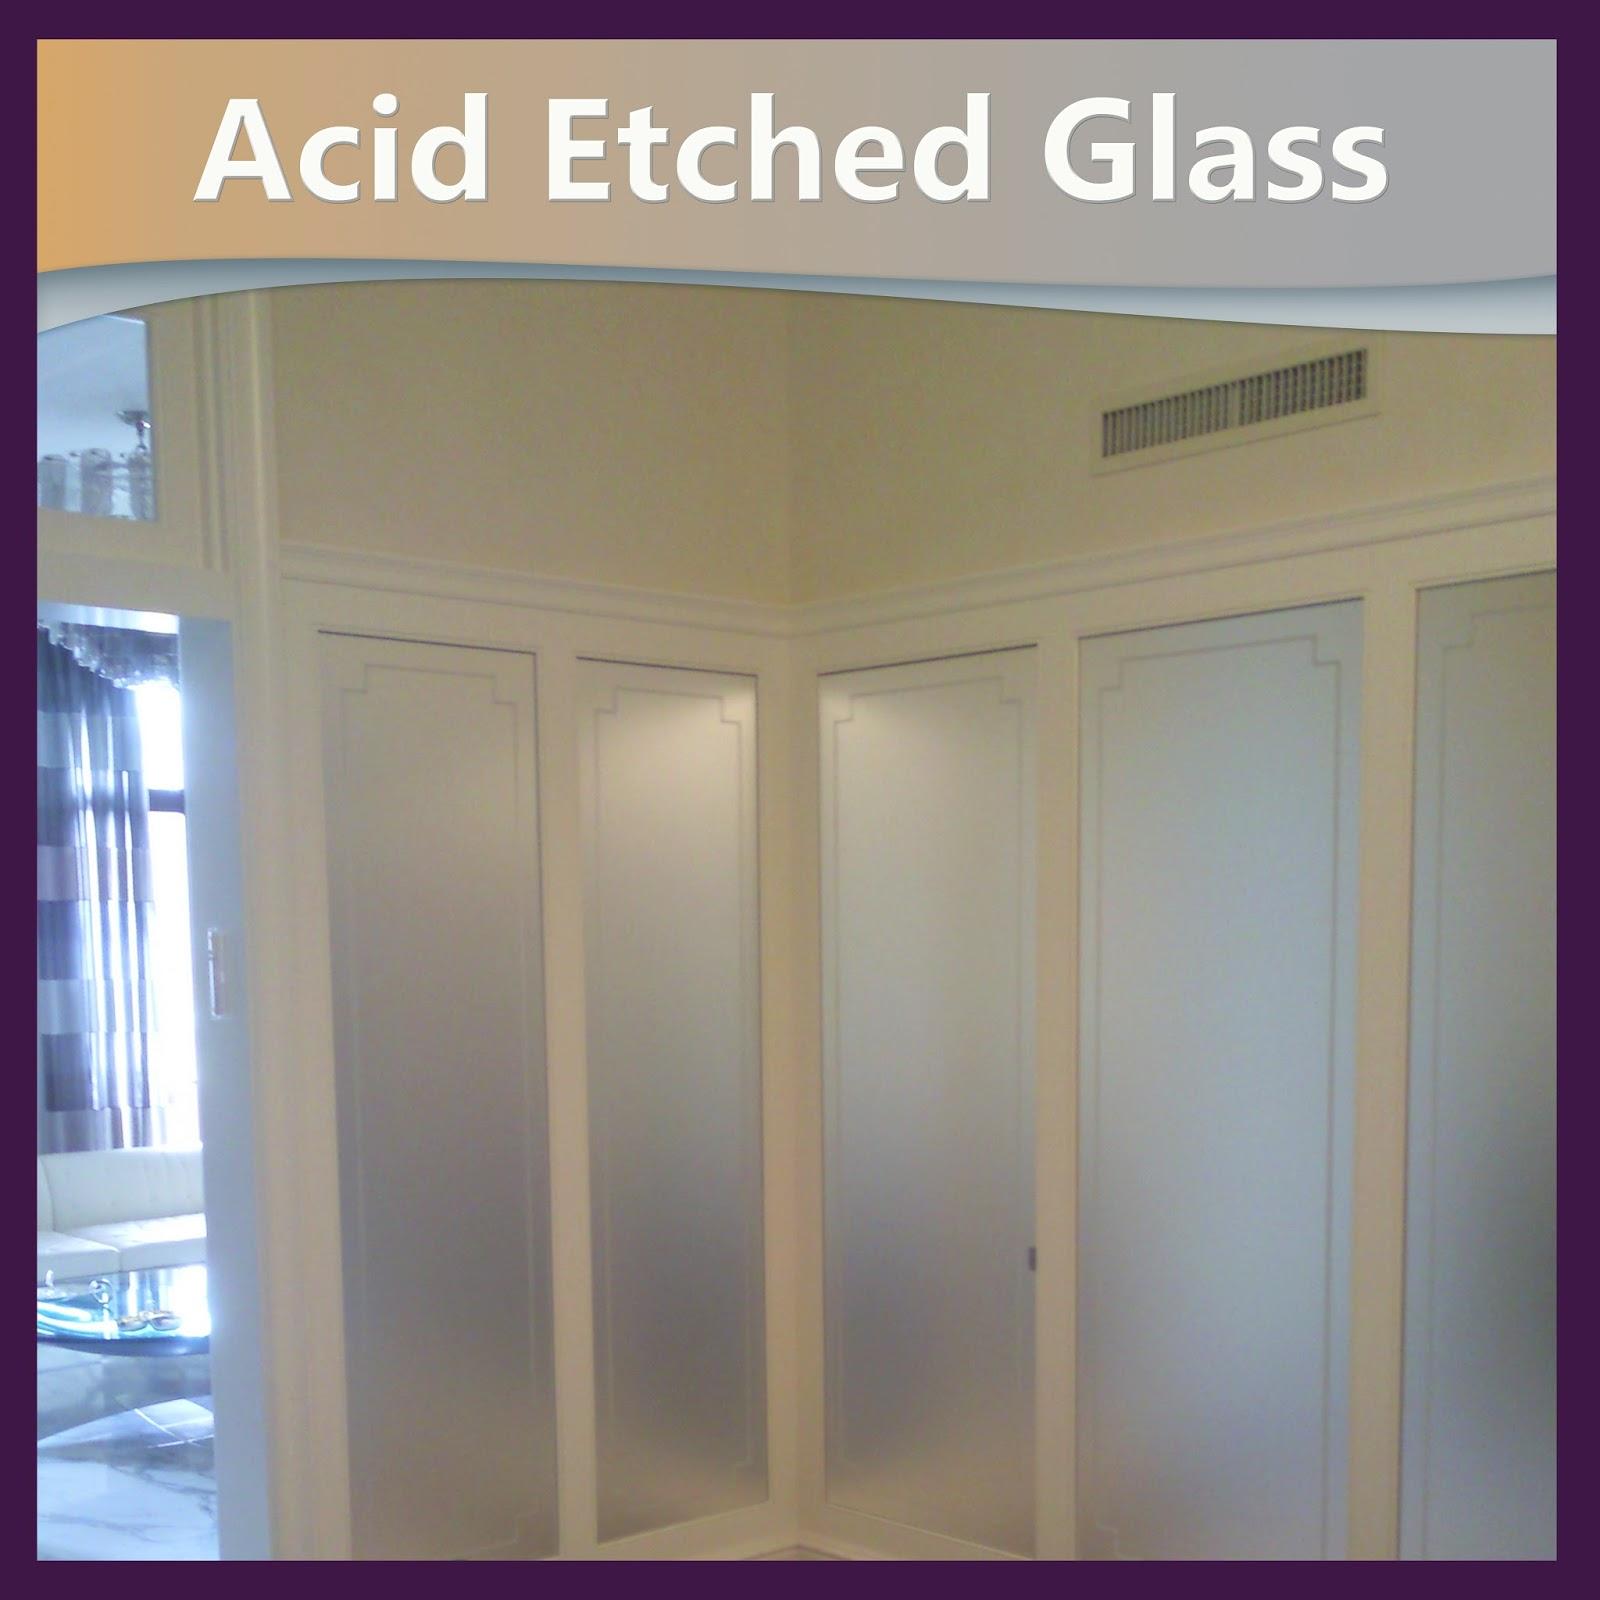 Acid Etched Glass Laminatedglassnyc Com